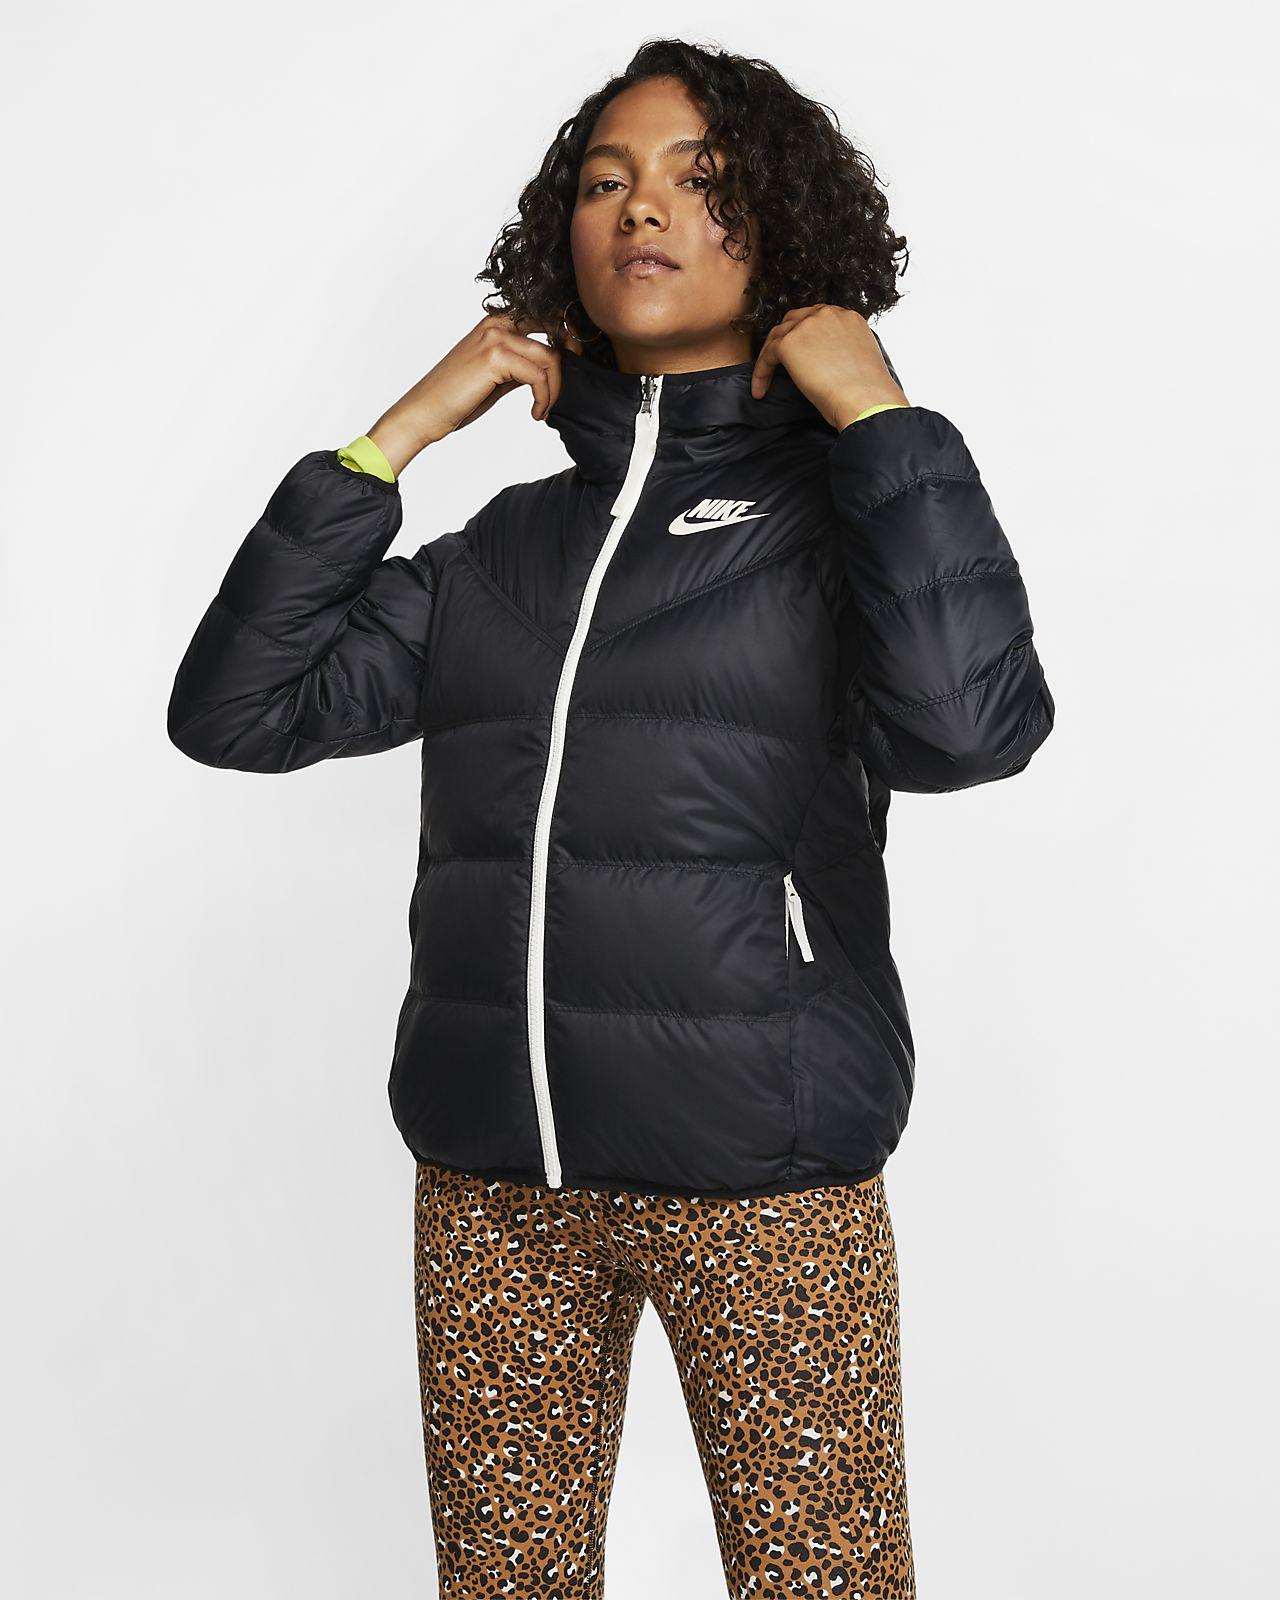 Jacke Nike Schwarz Nike Windrunner Sportswear Windrunner